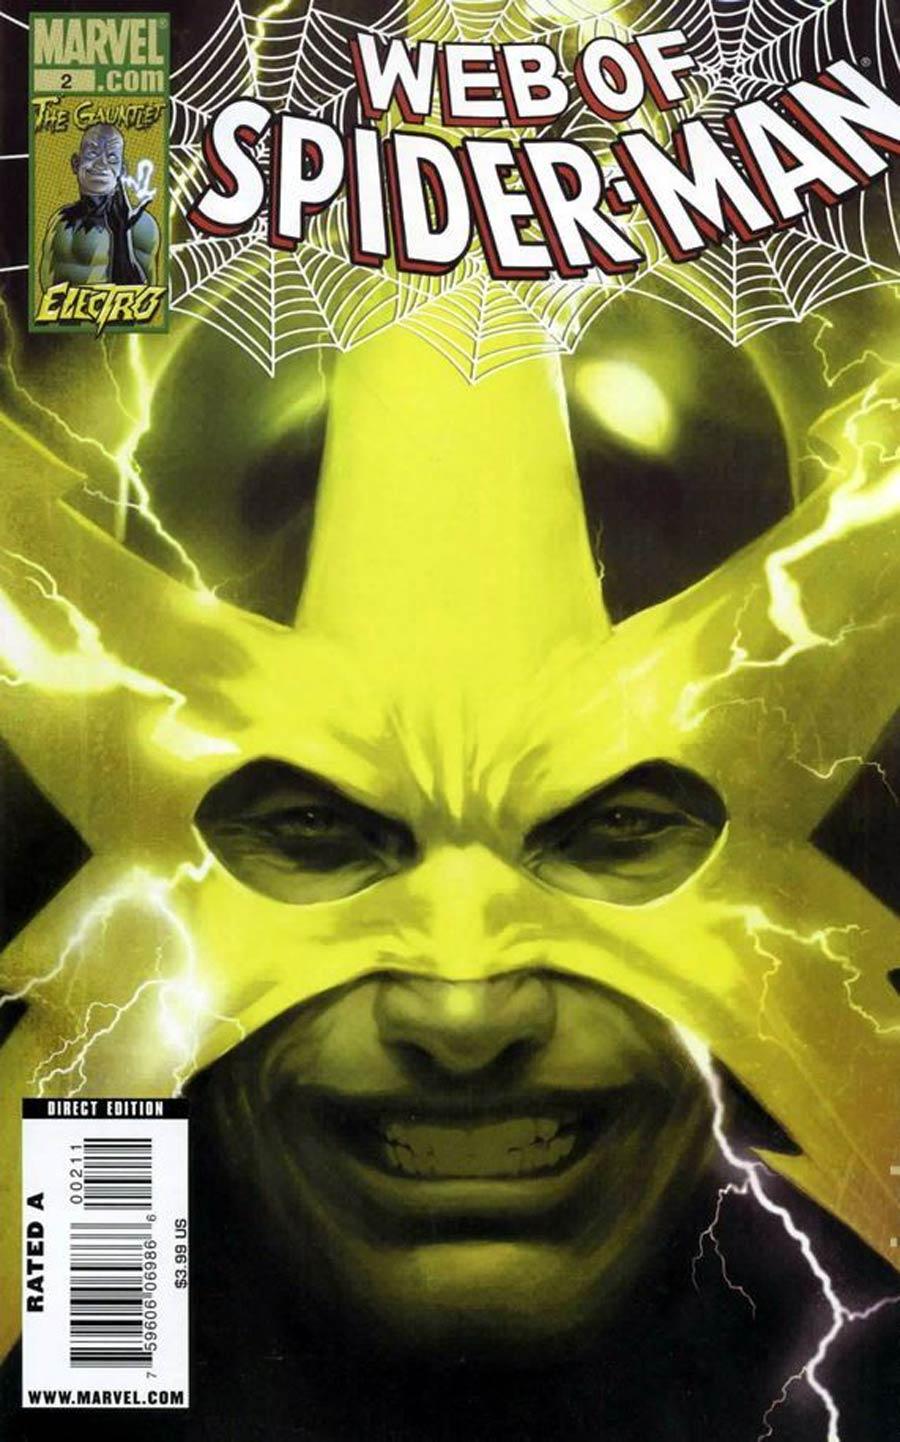 Web Of Spider-Man Vol 2 #2